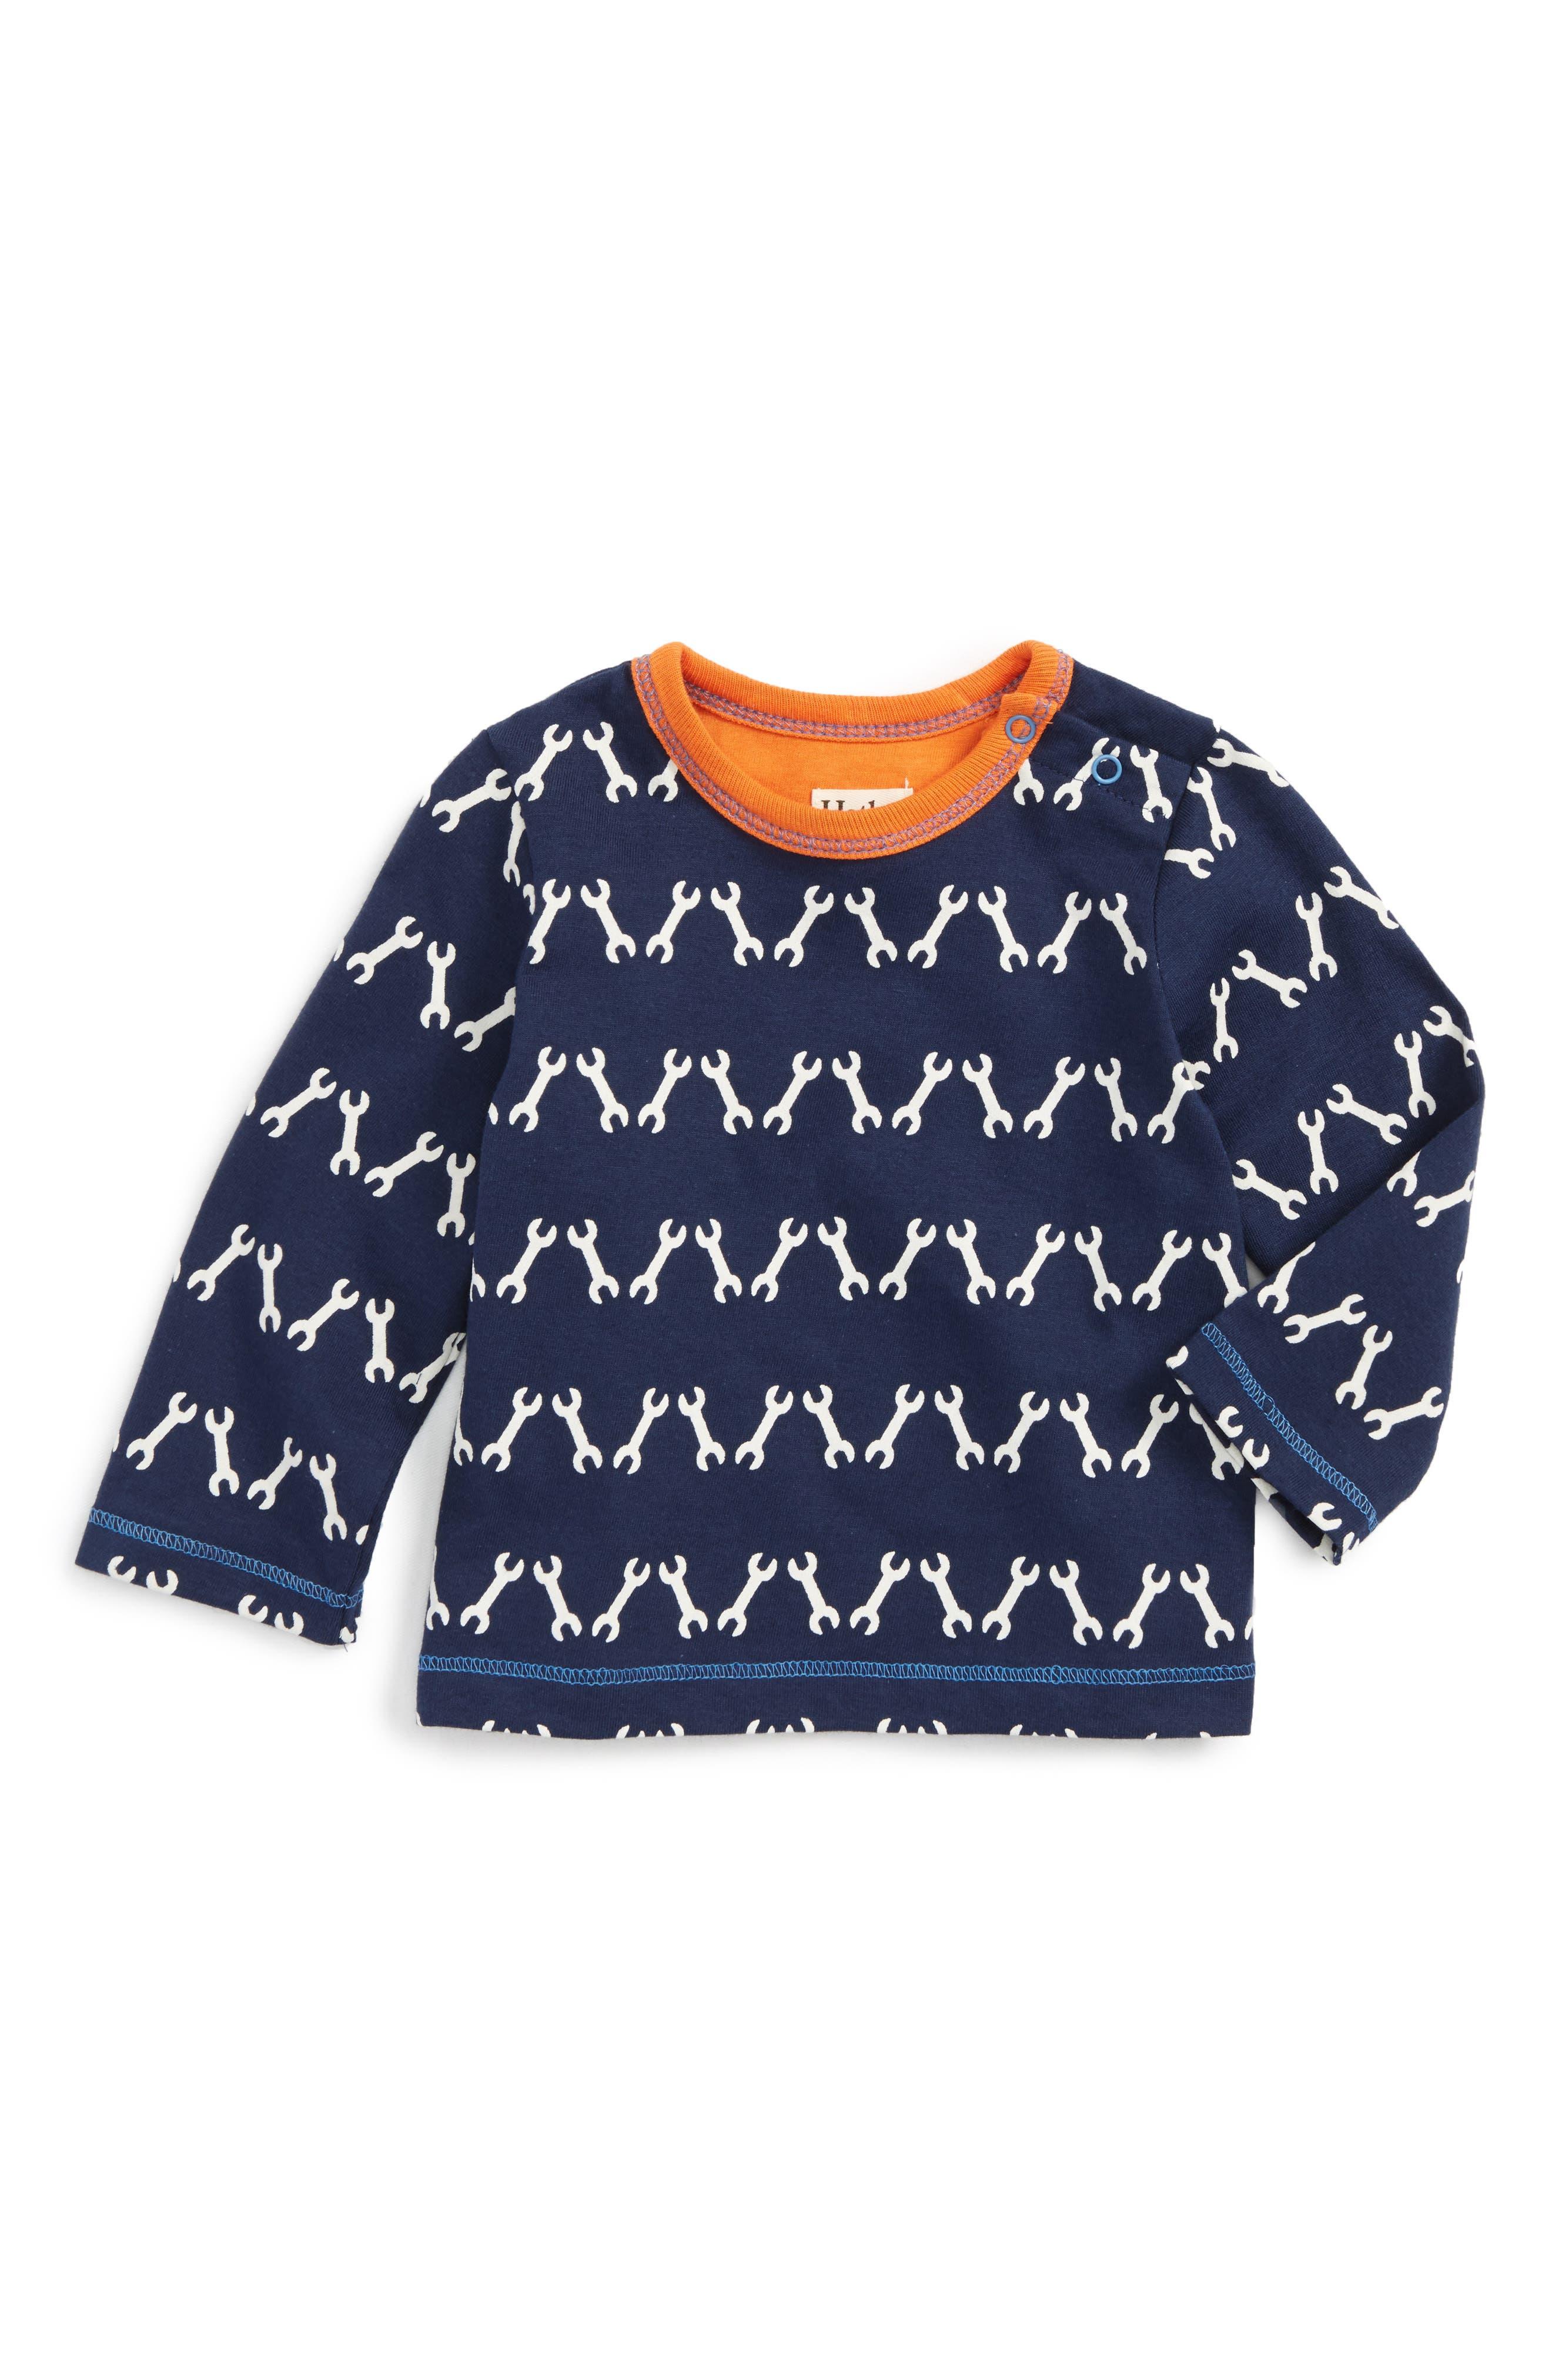 Alternate Image 1 Selected - Hatley Long Sleeve T-Shirt (Baby Boys)